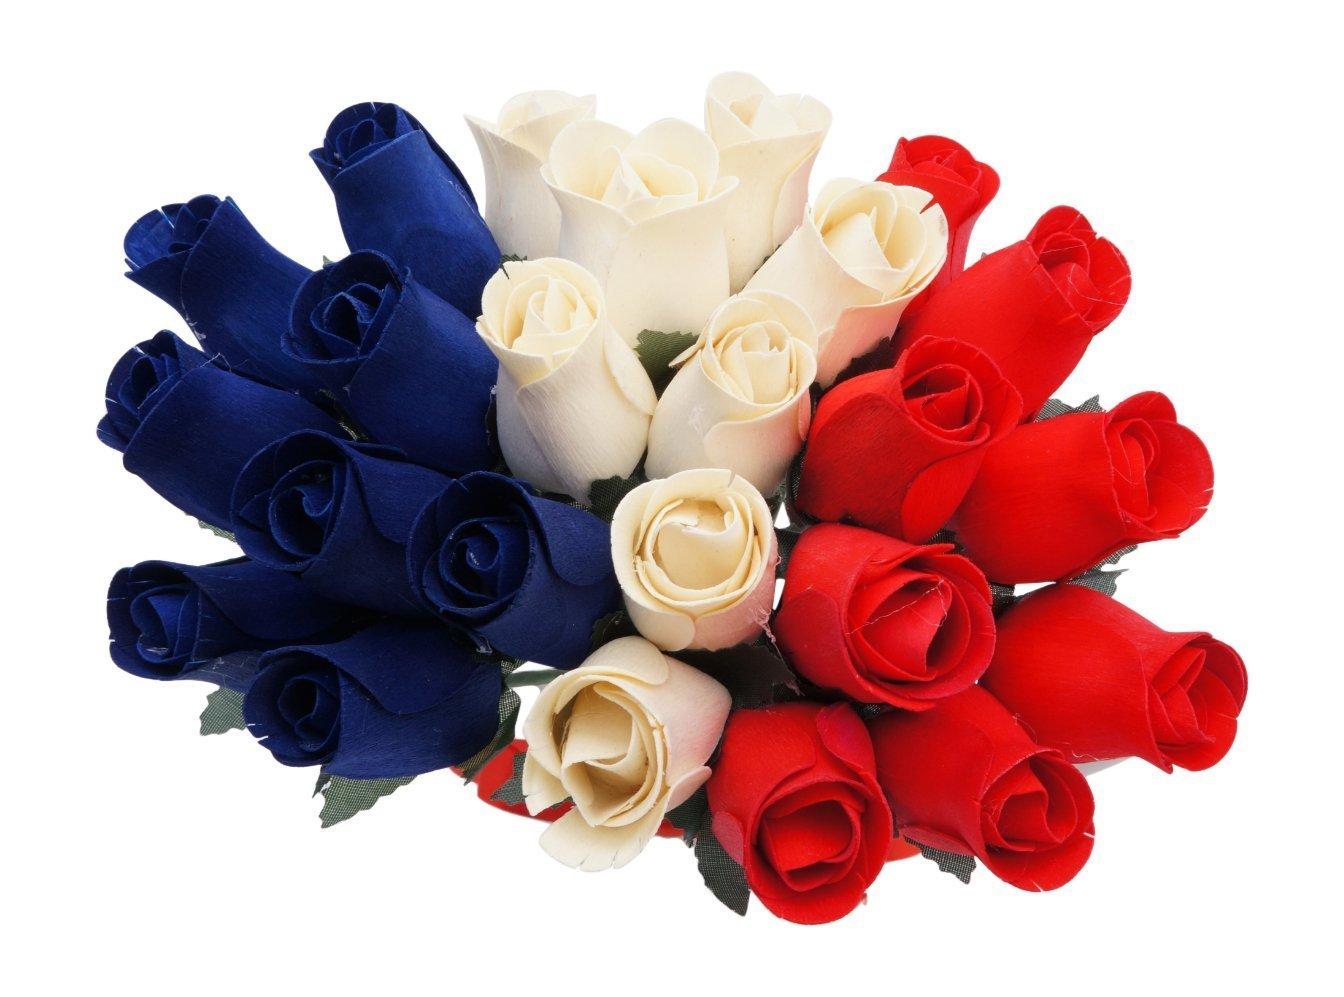 2 Dozen Wooden Rose Flowers Red White and Blue! | eBay